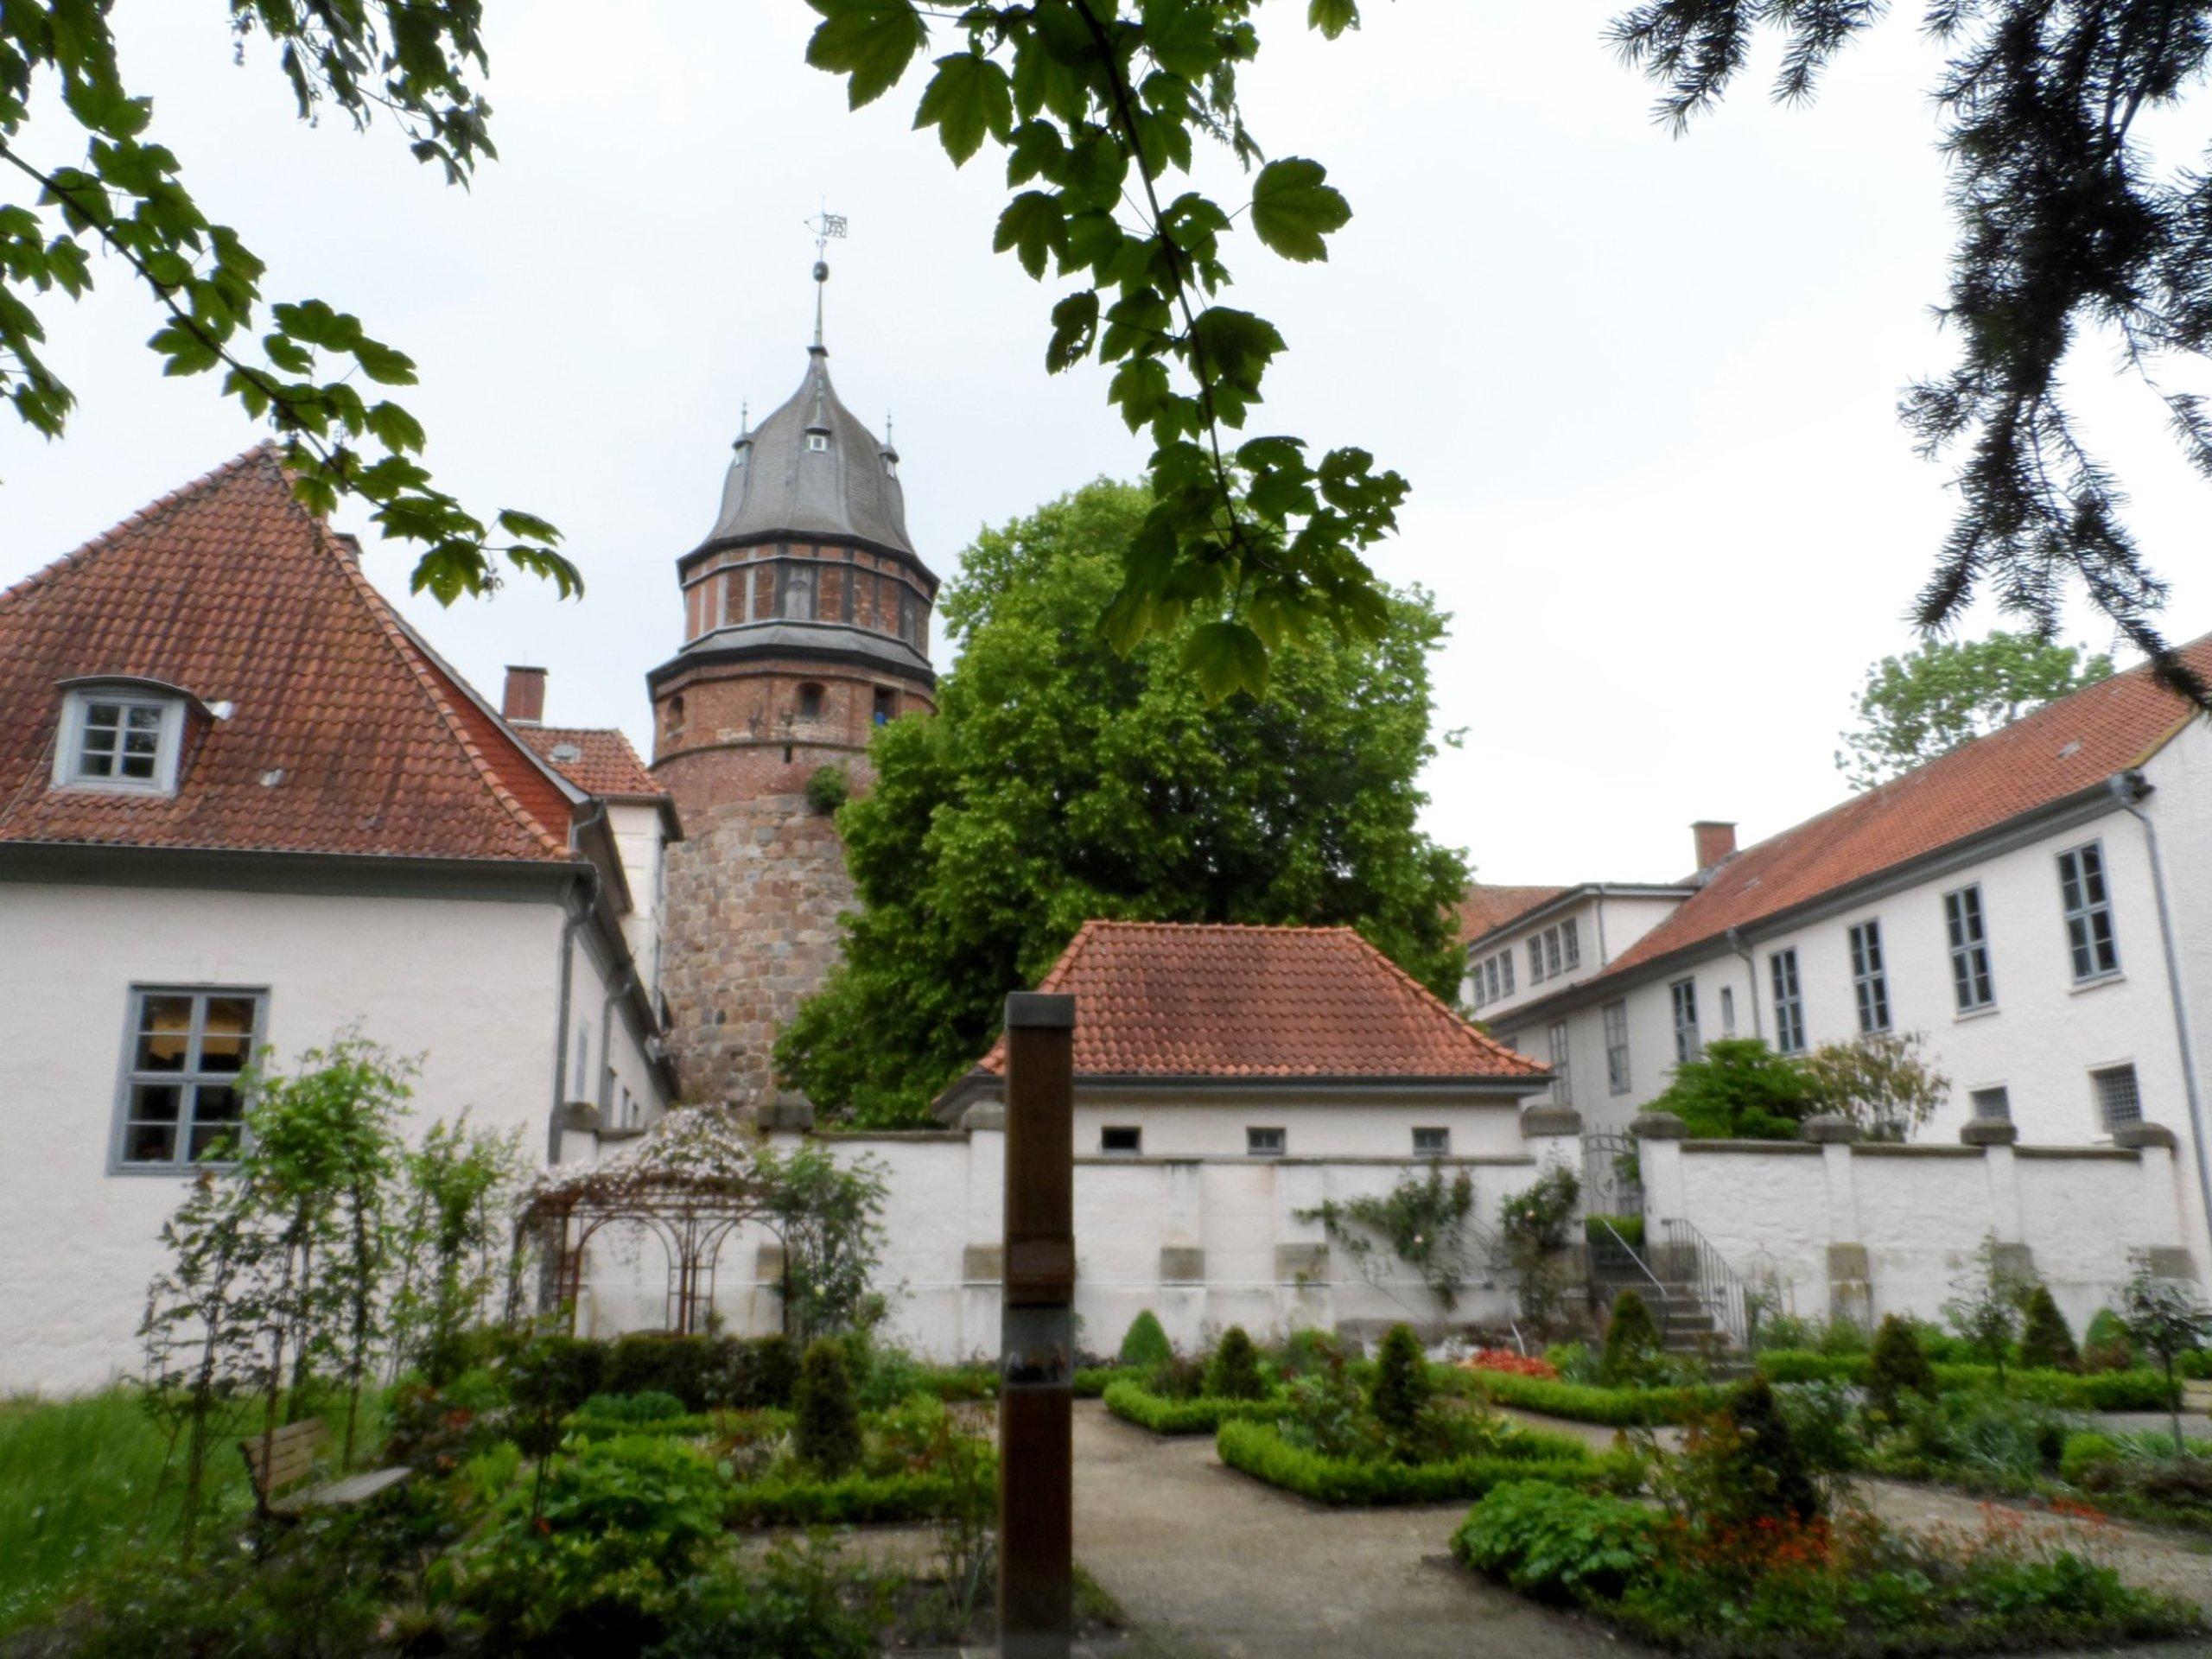 Bambusgarten Luxus Hotel Strangmeyer Reviews Diepholz Germany Tripadvisor